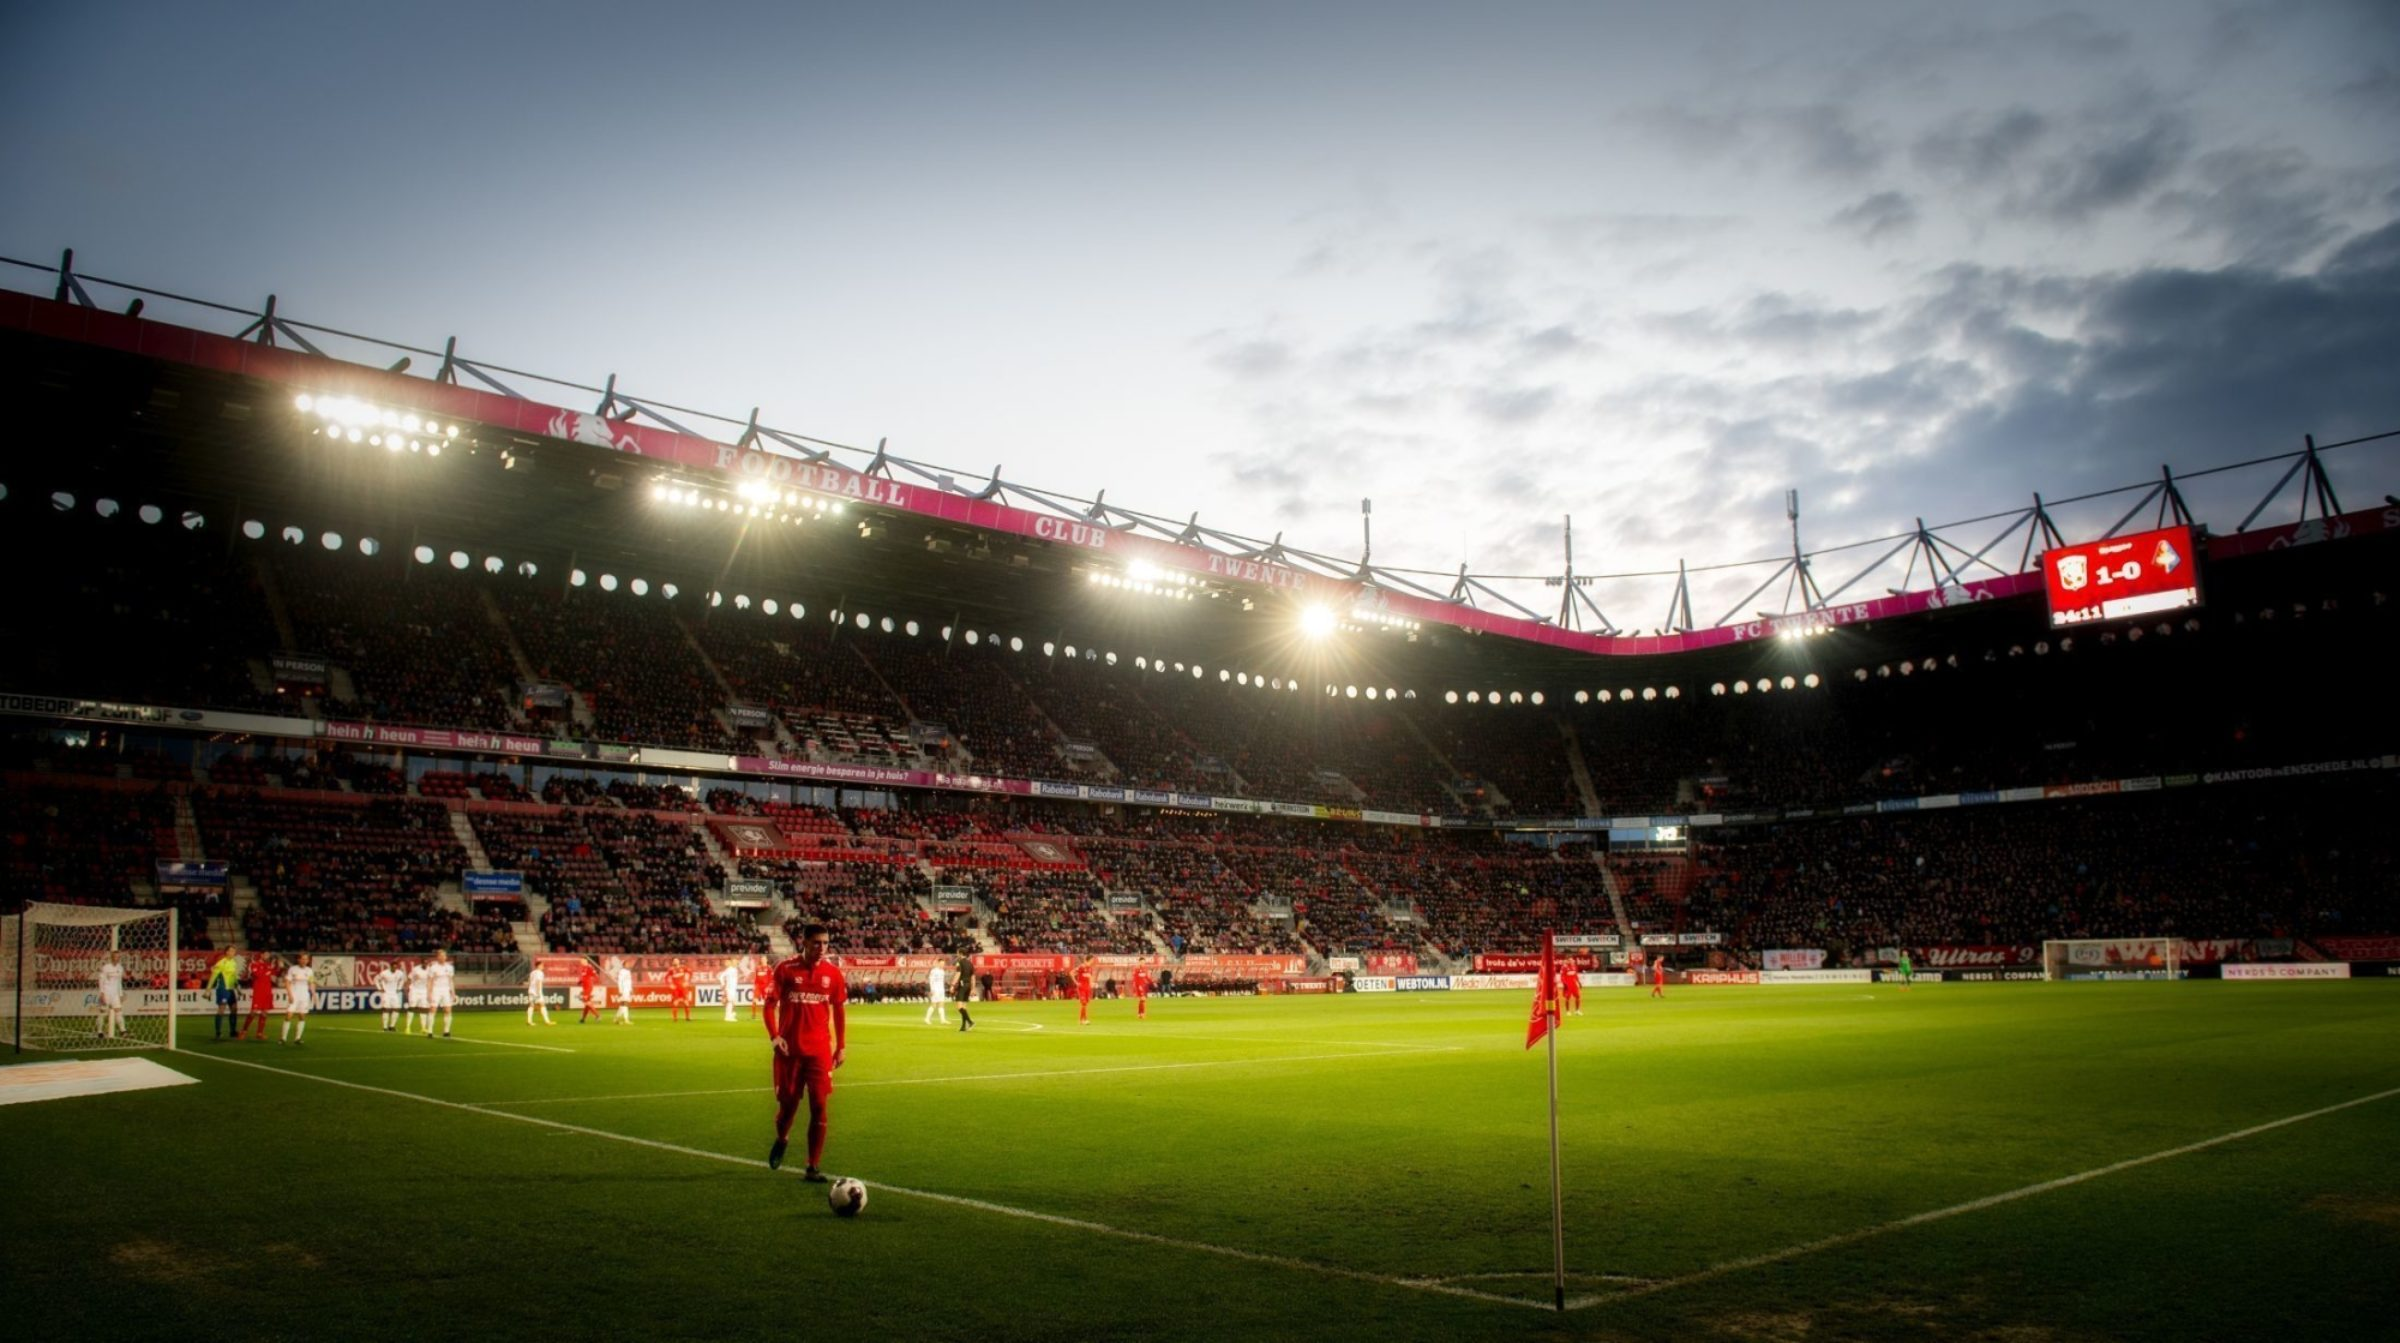 2019 FC Twente Sport en spel 6 3323 1563353444 35hxl1vuz9